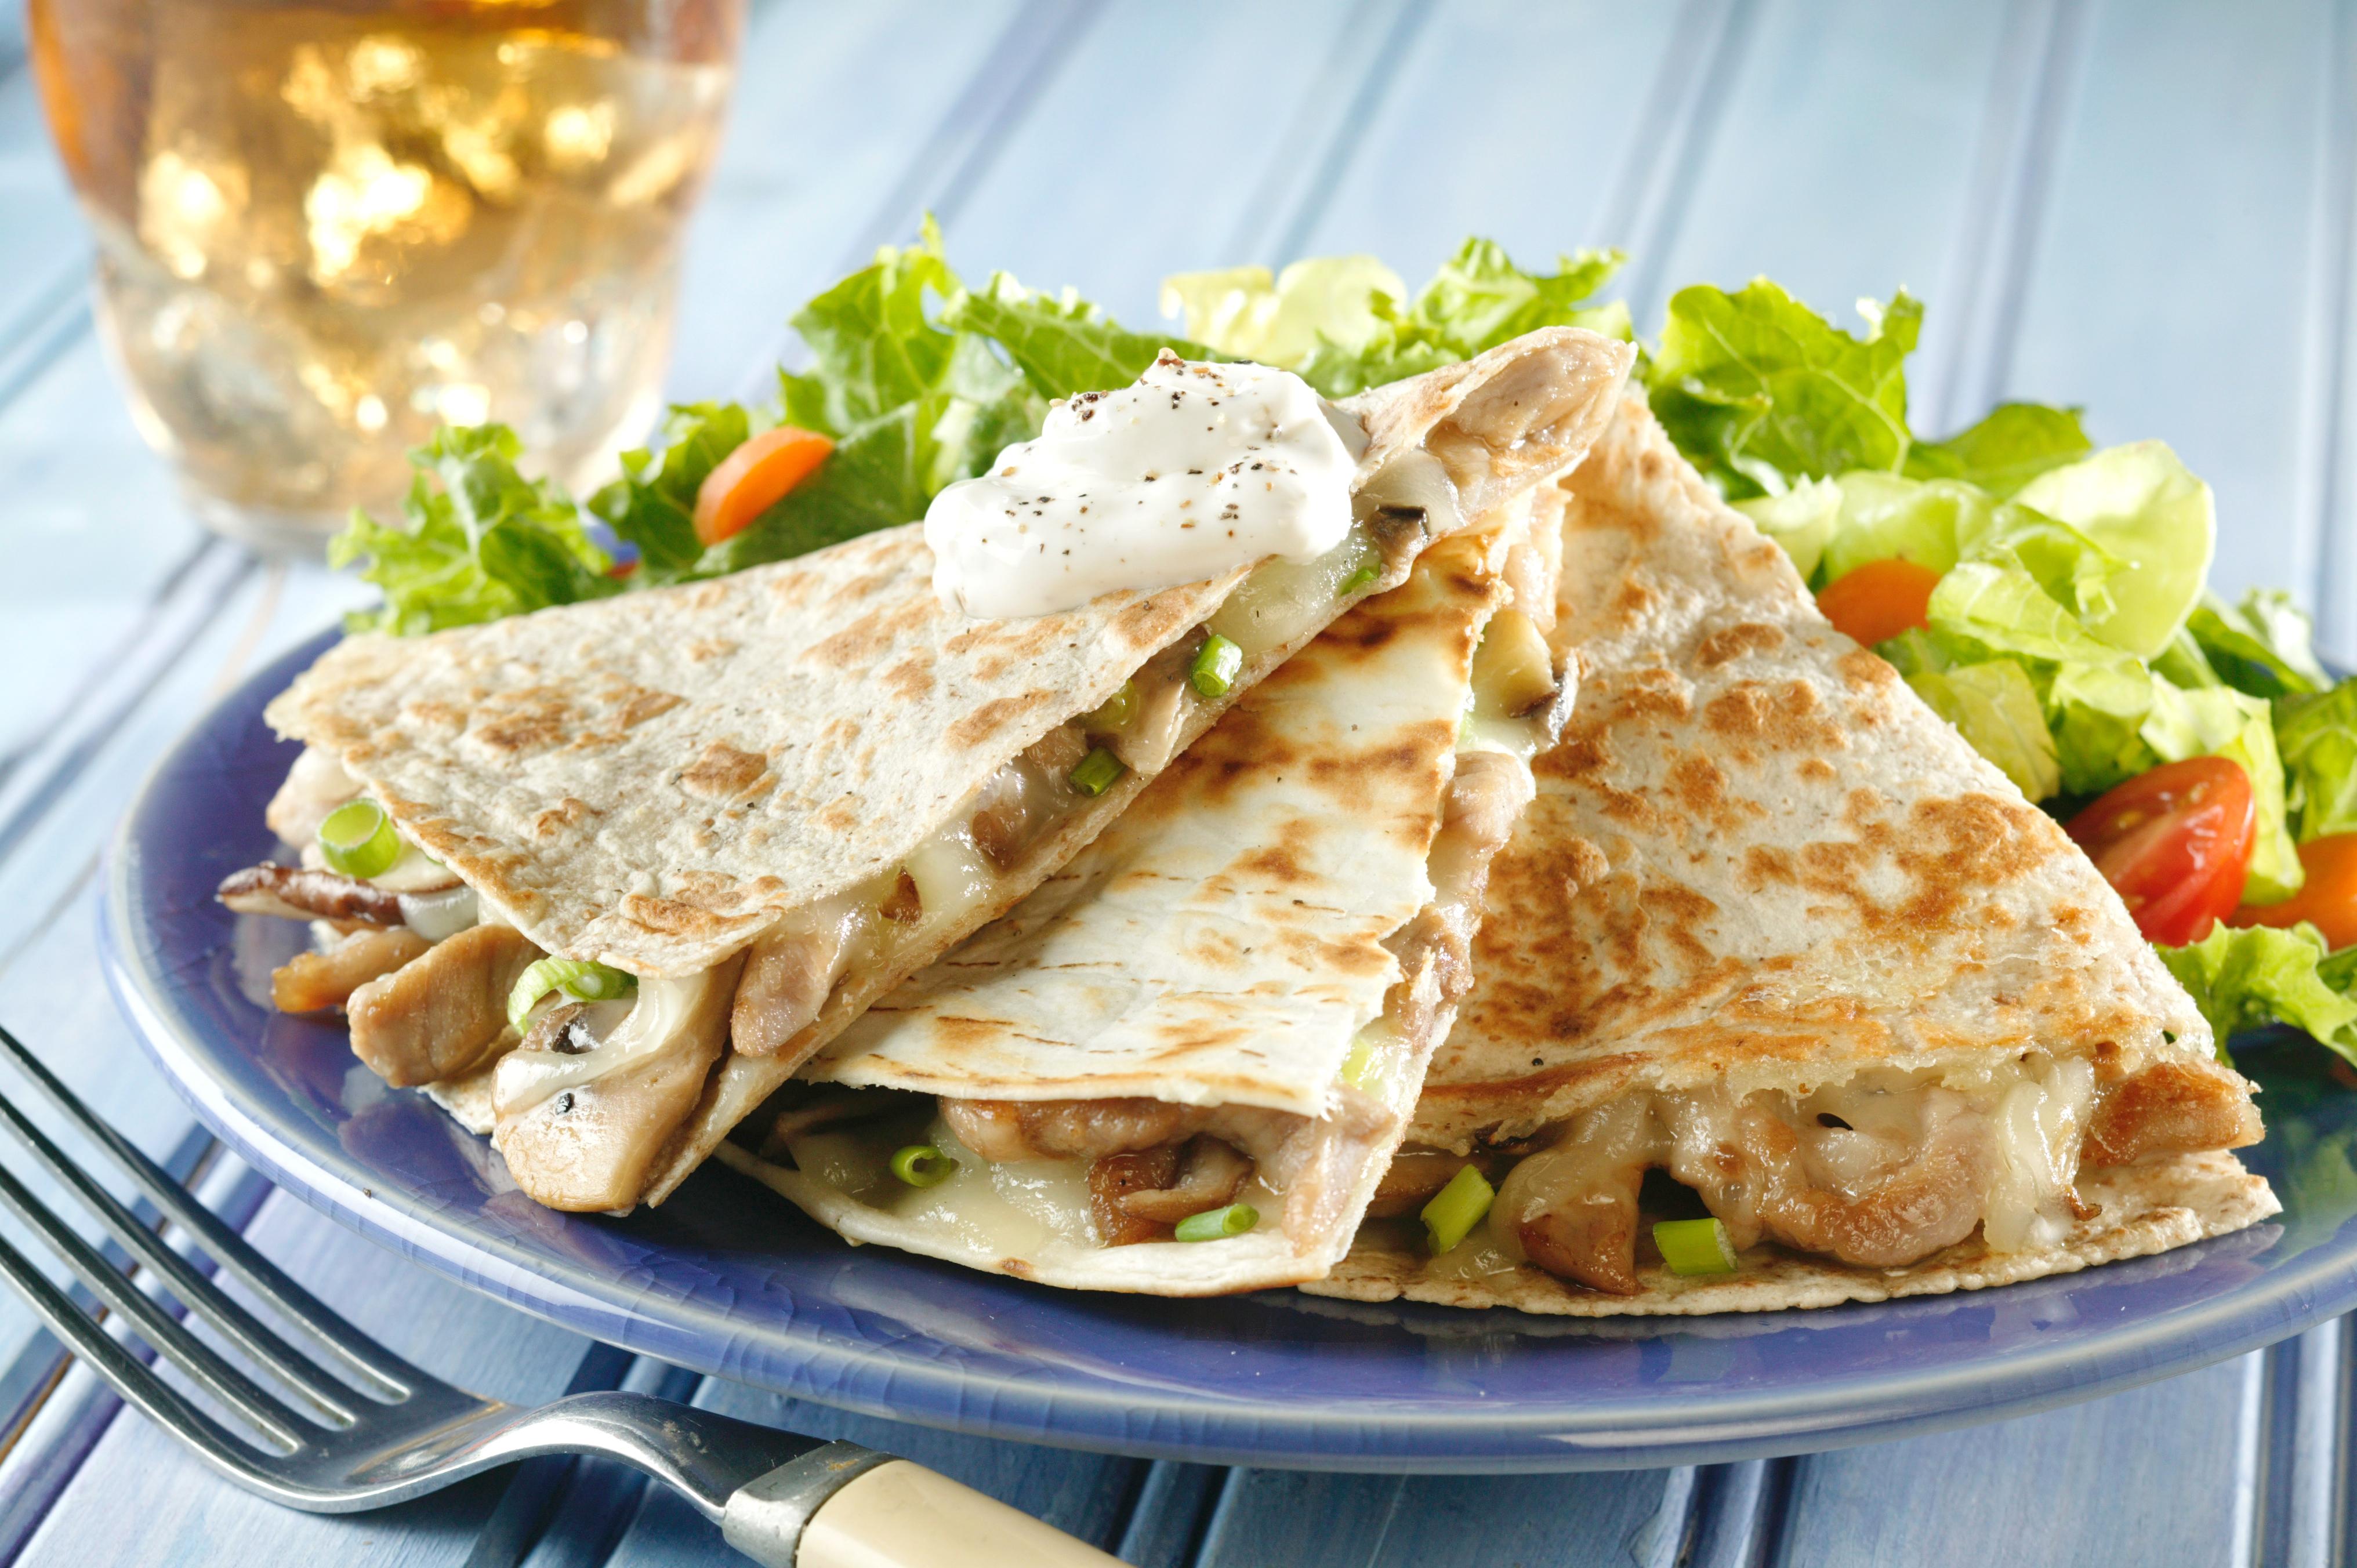 Pork And Mushroom Quesadillas - Pork Recipes - Pork Be ...